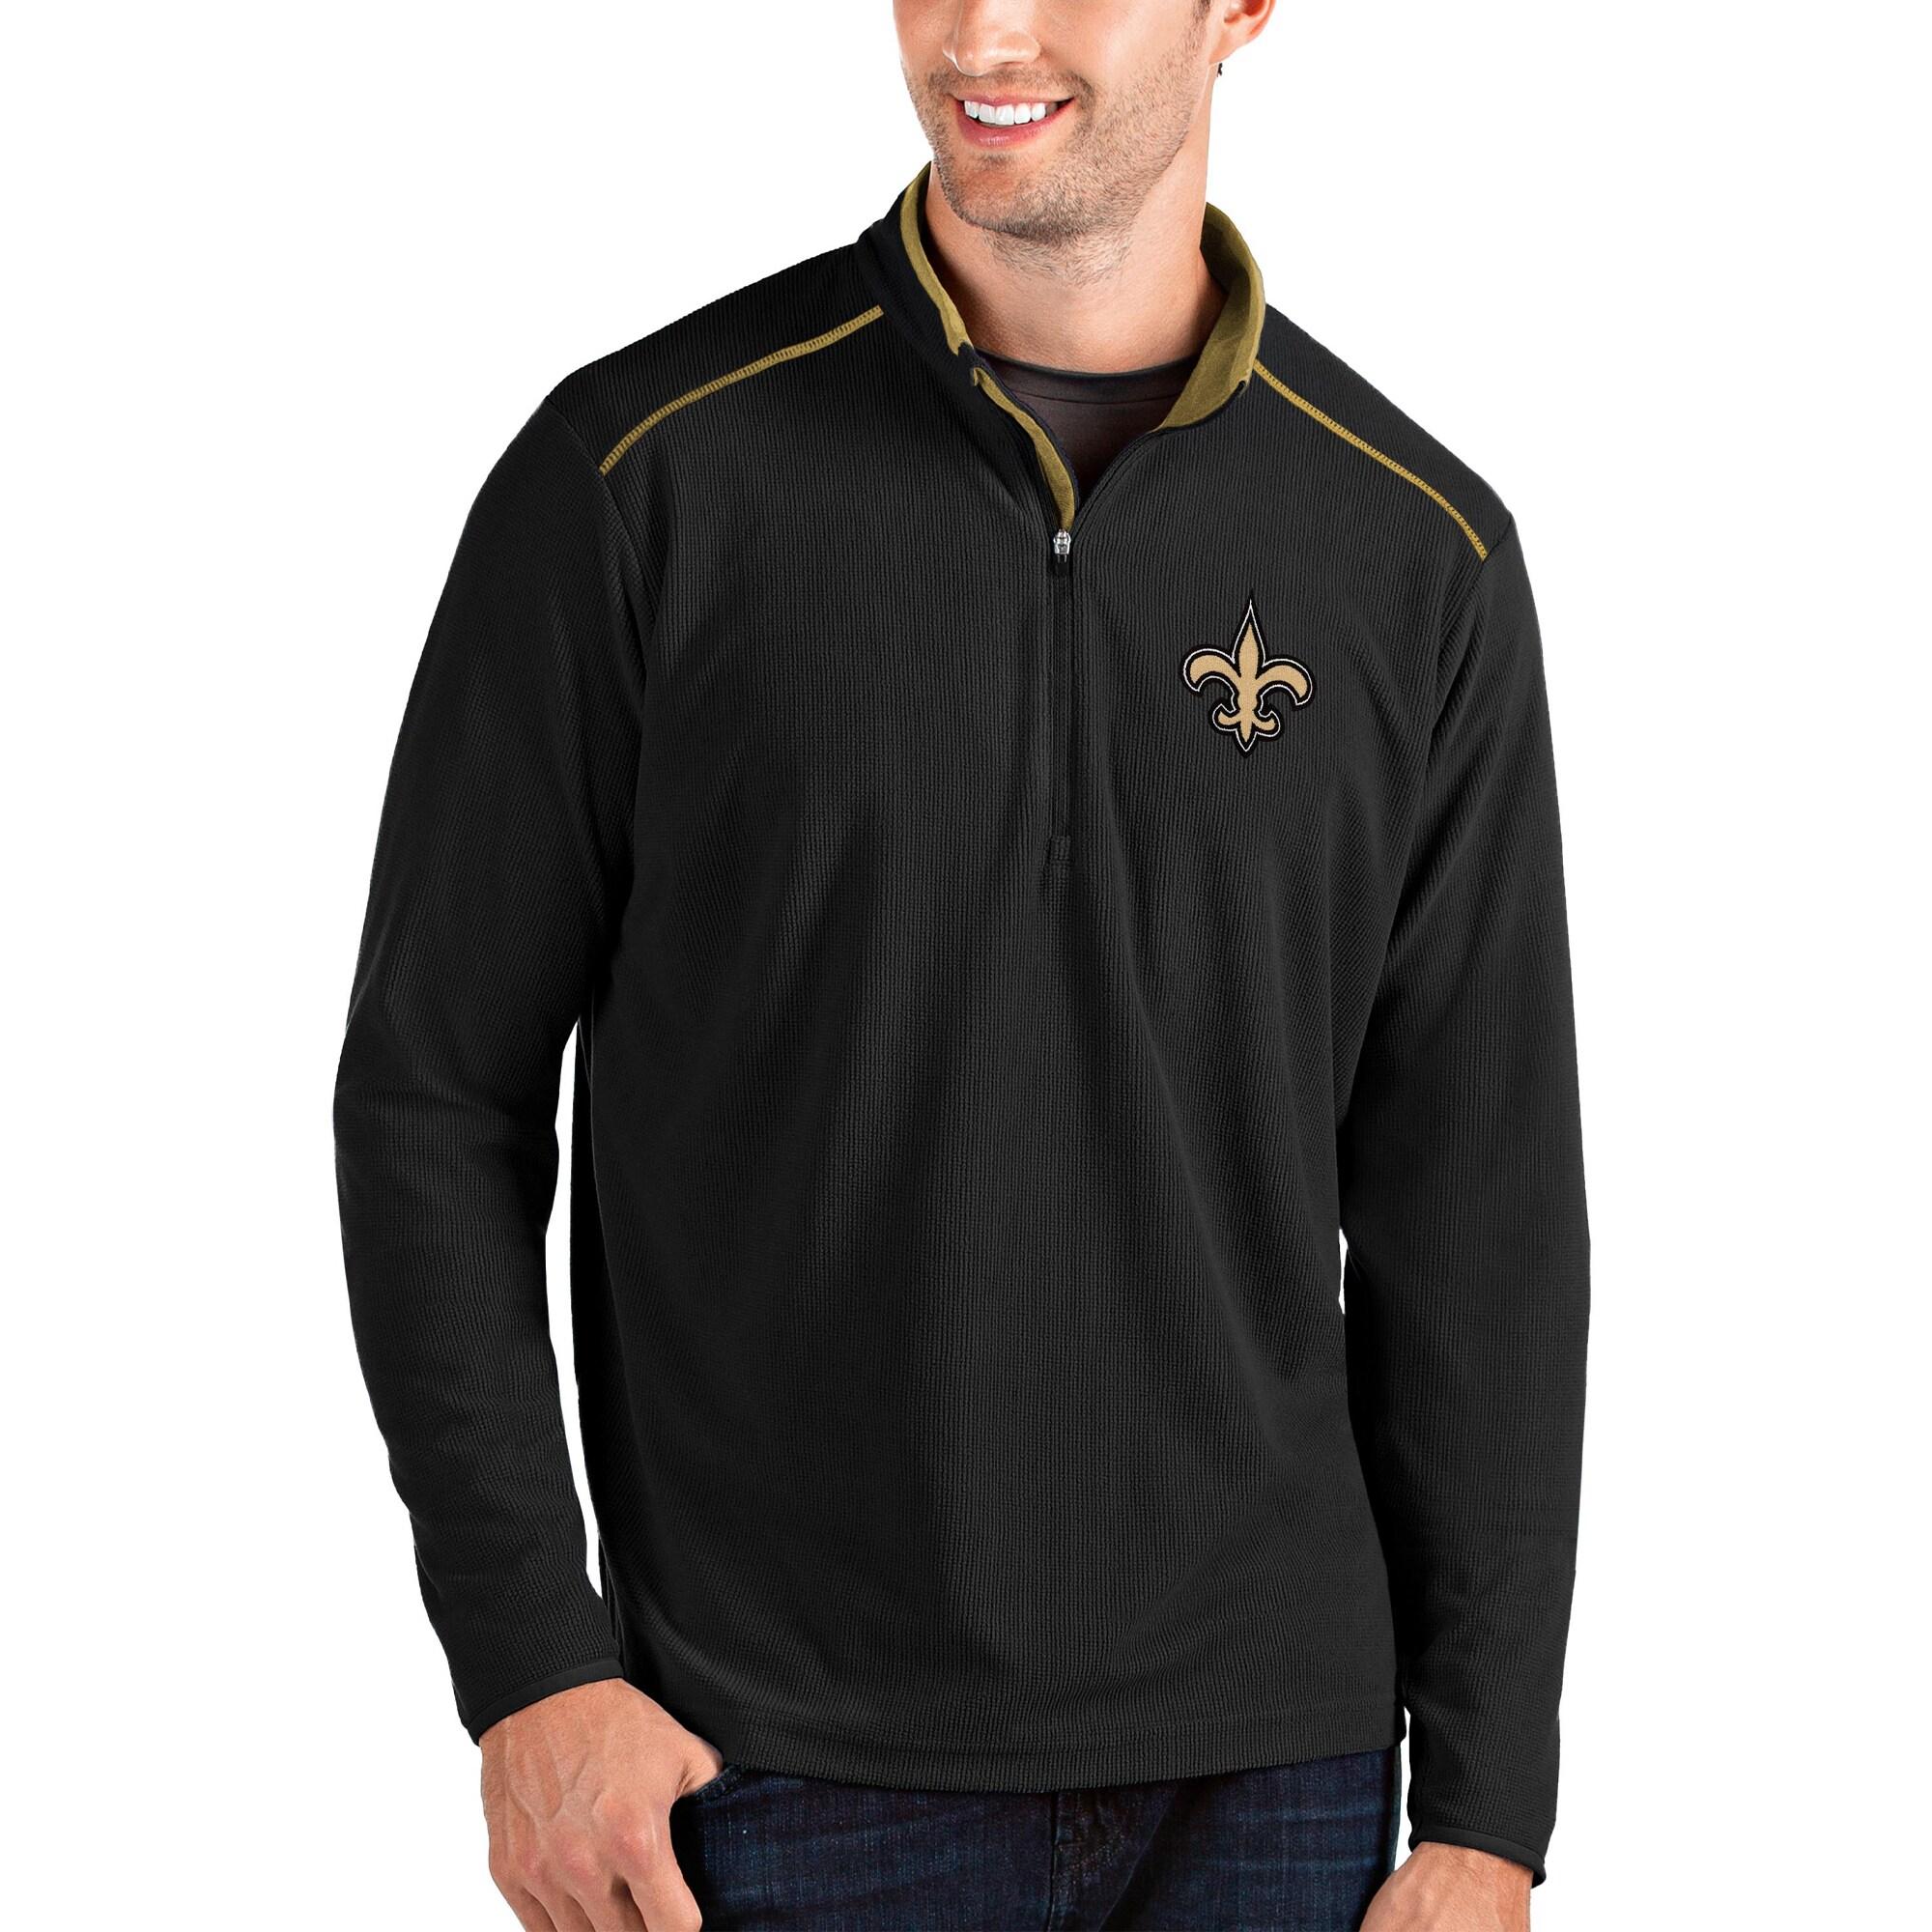 New Orleans Saints Antigua Glacier Quarter-Zip Pullover Jacket - Black/Gold